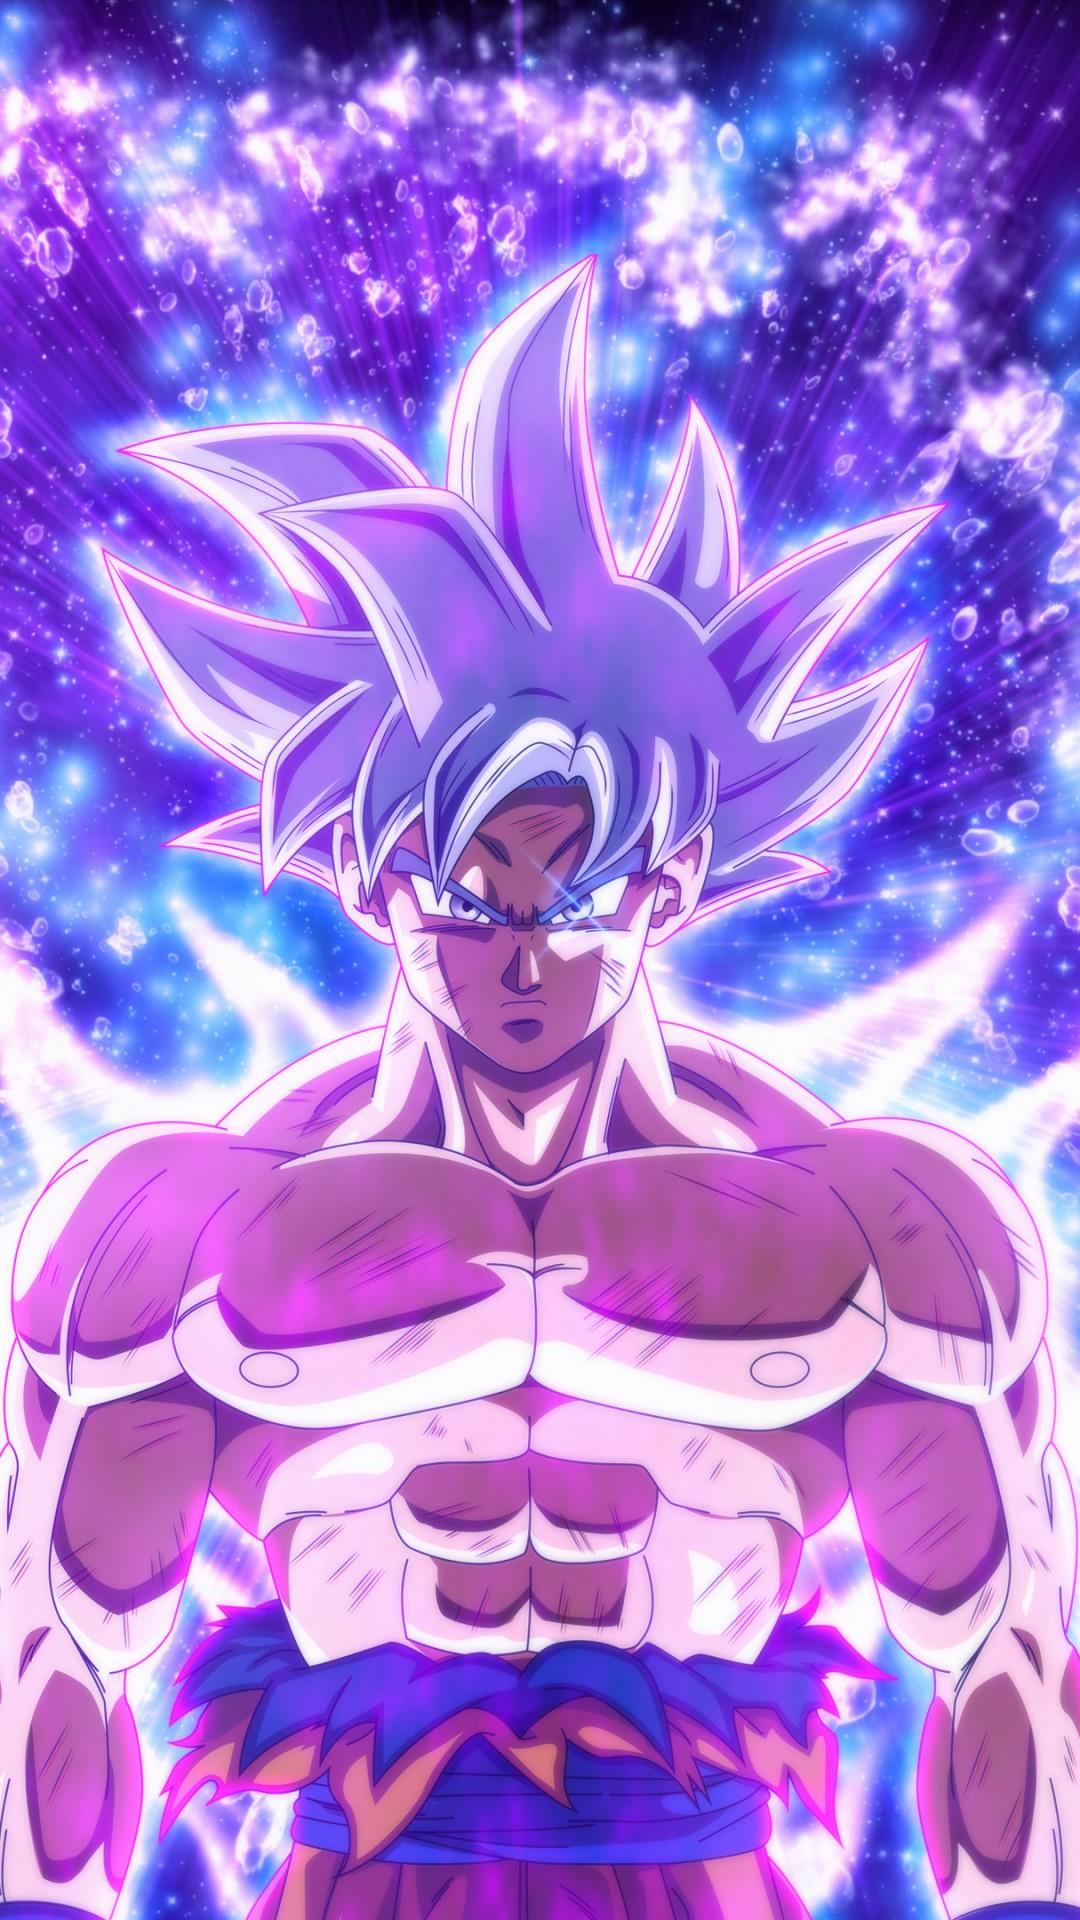 179 dragon ball super wallpaper. Dragon Ball Super Goku Ultra Instinct 4K Wallpapers | HD ...